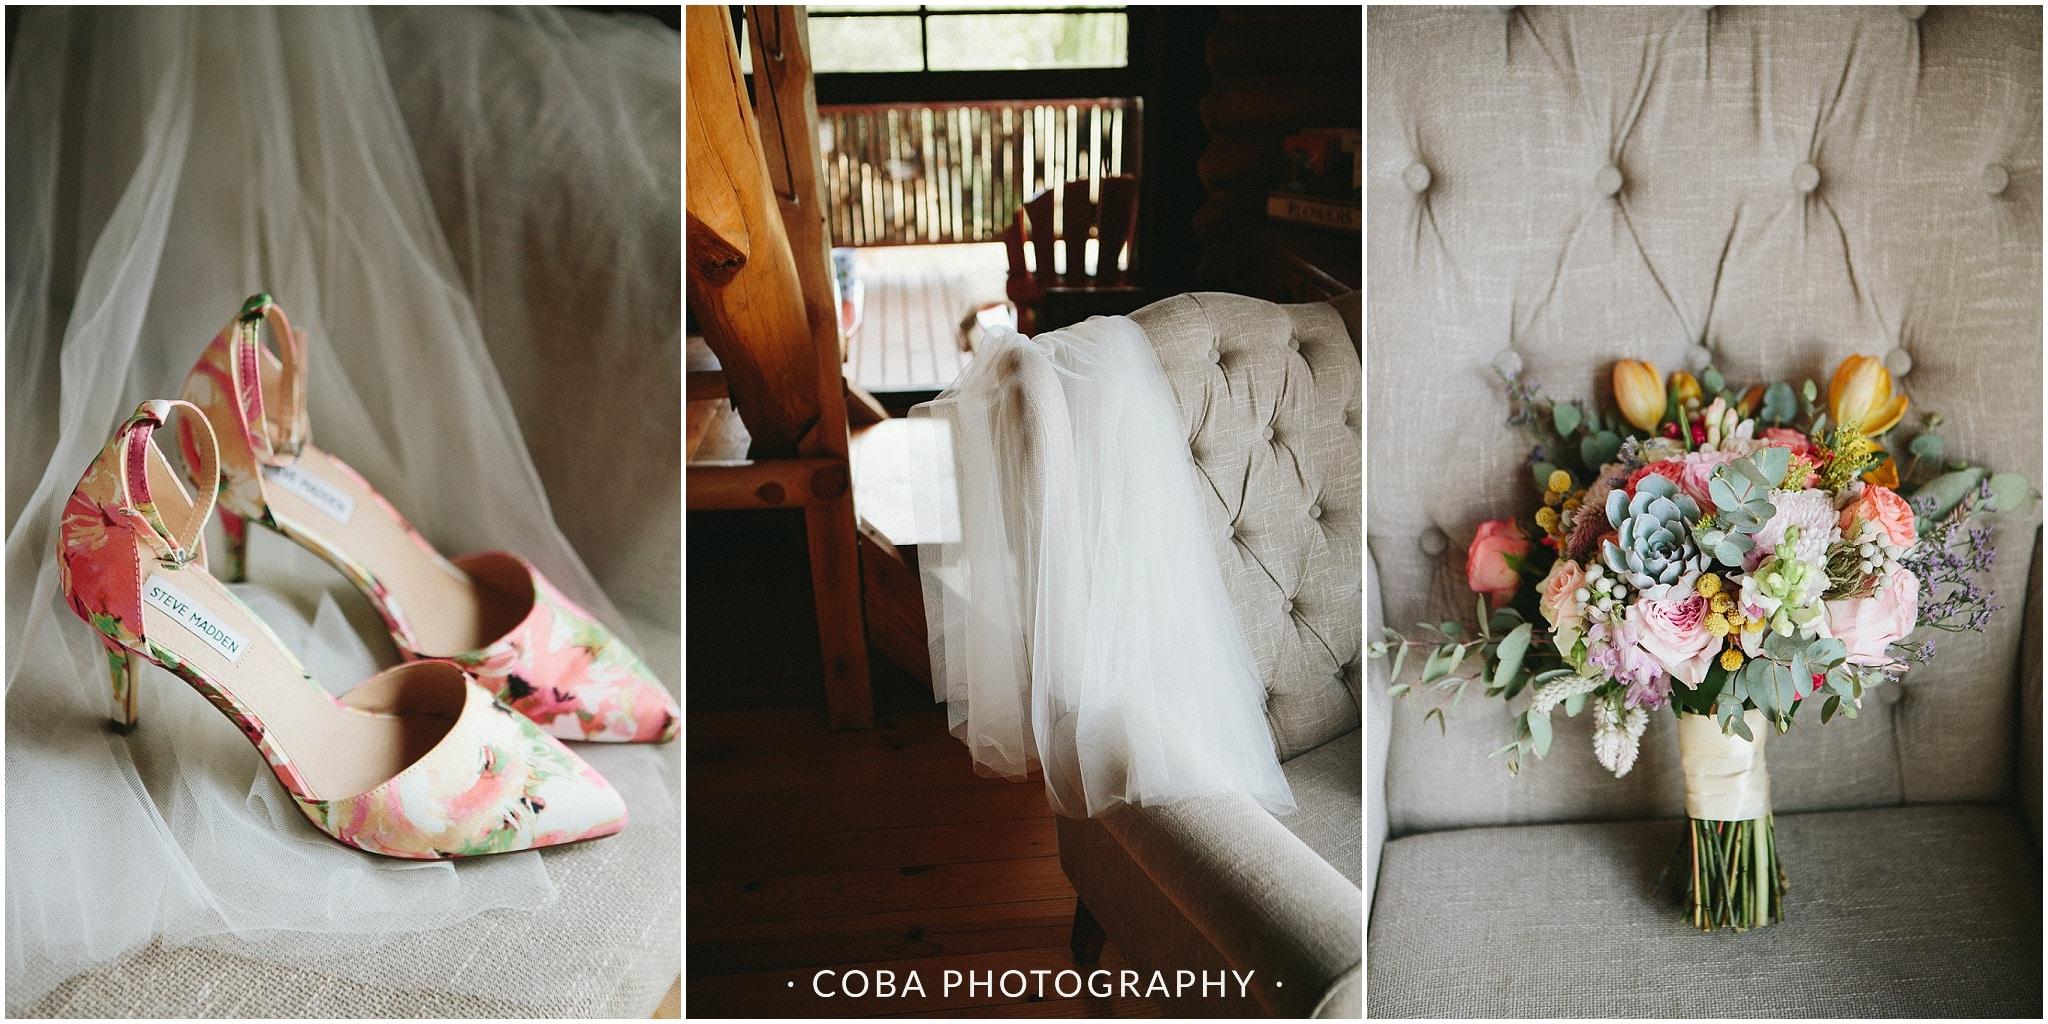 John&Pad - Olive Rock - Coba Photography (28)